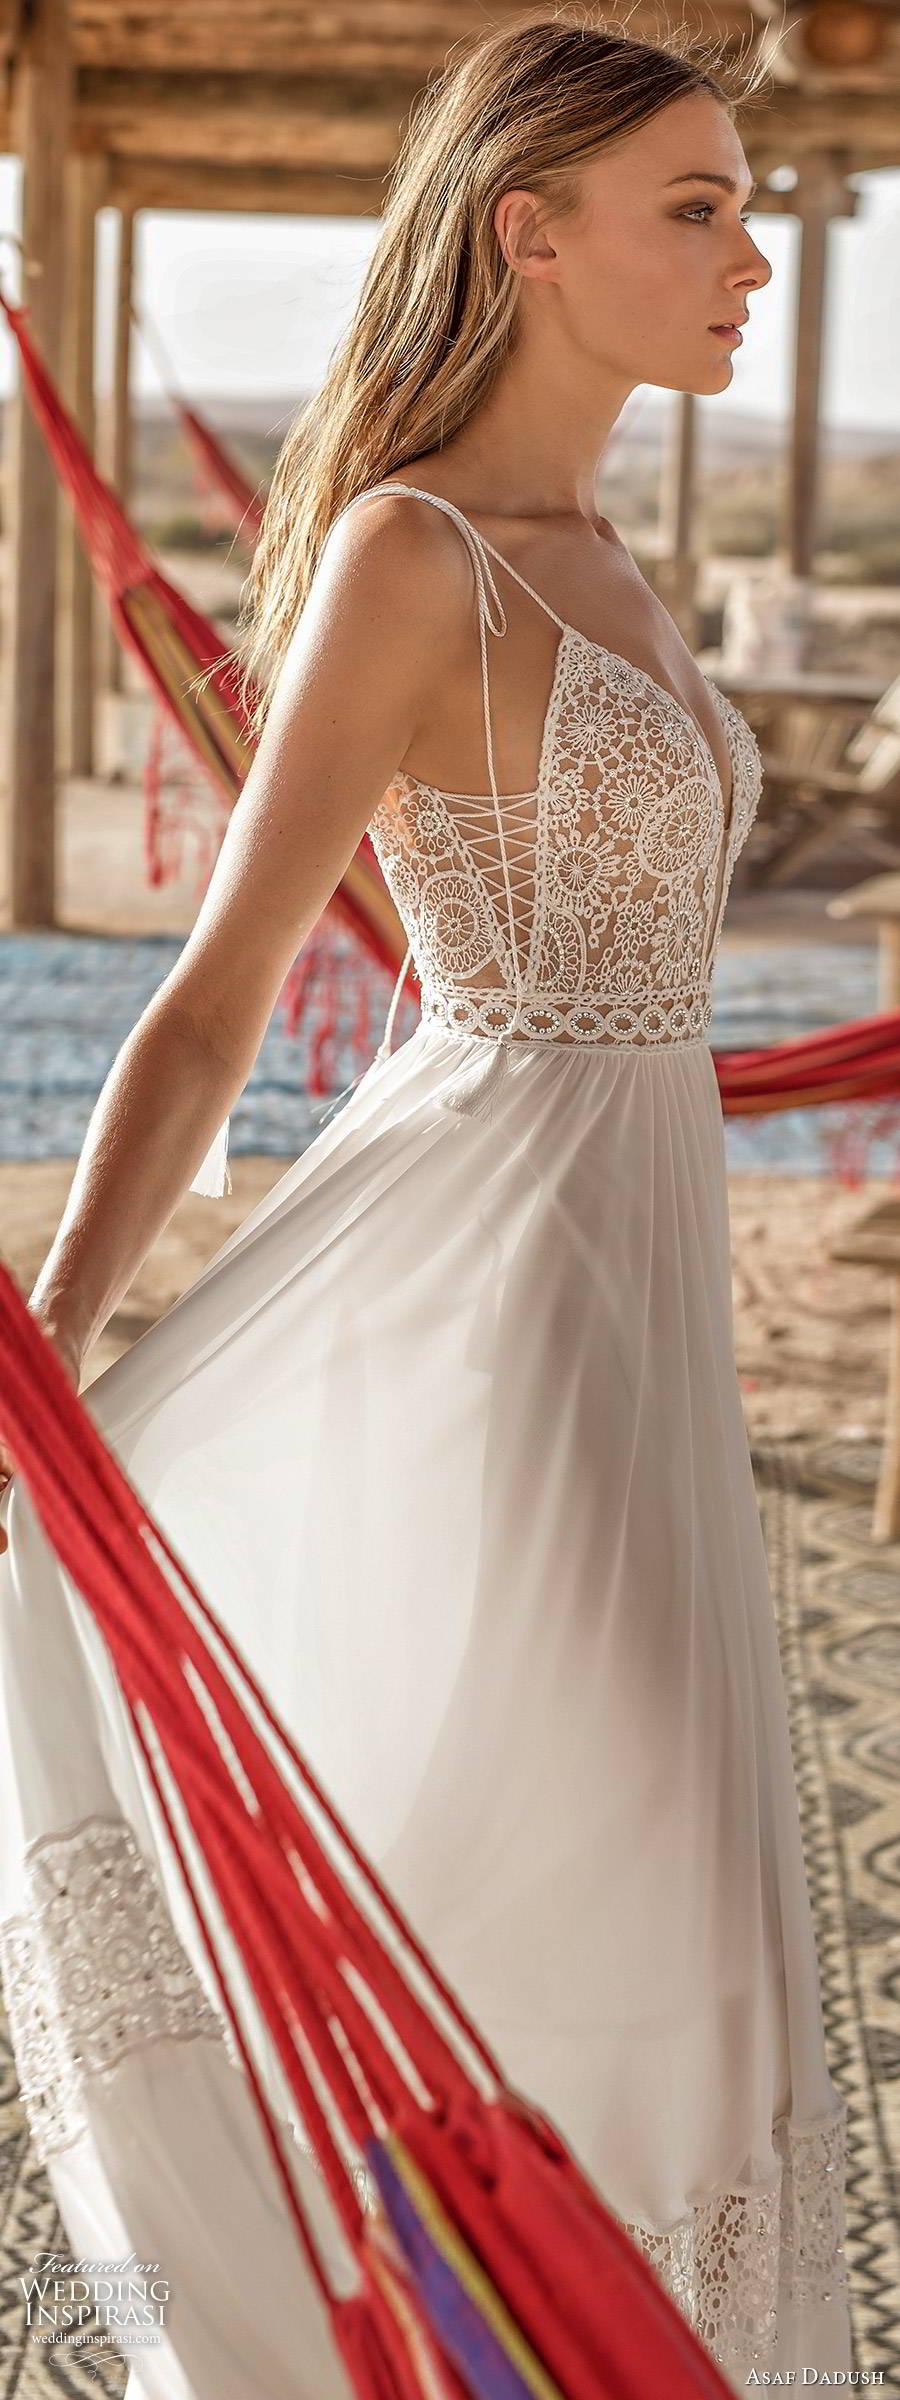 asaf dadush 2019 bridal sleeveless thin straps plunging v neckline embellished bodice romantic boho a line wedding dress low back sweep train (8) zsv